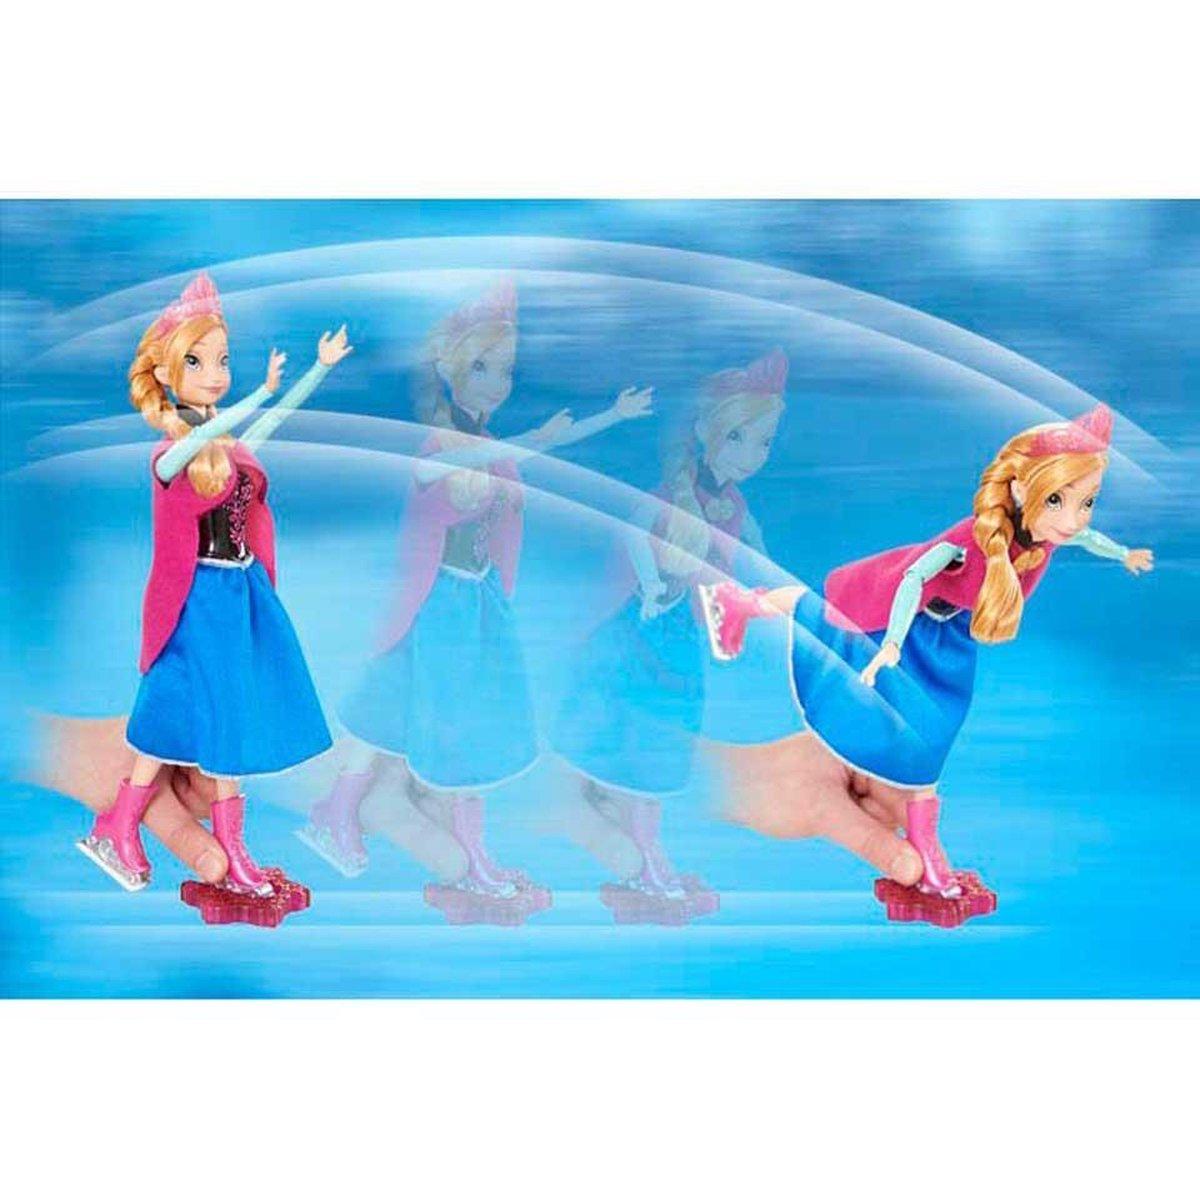 Bol Com Disney Frozen Schaatsende Anna Ice Skating Schaatsen Anna Pop